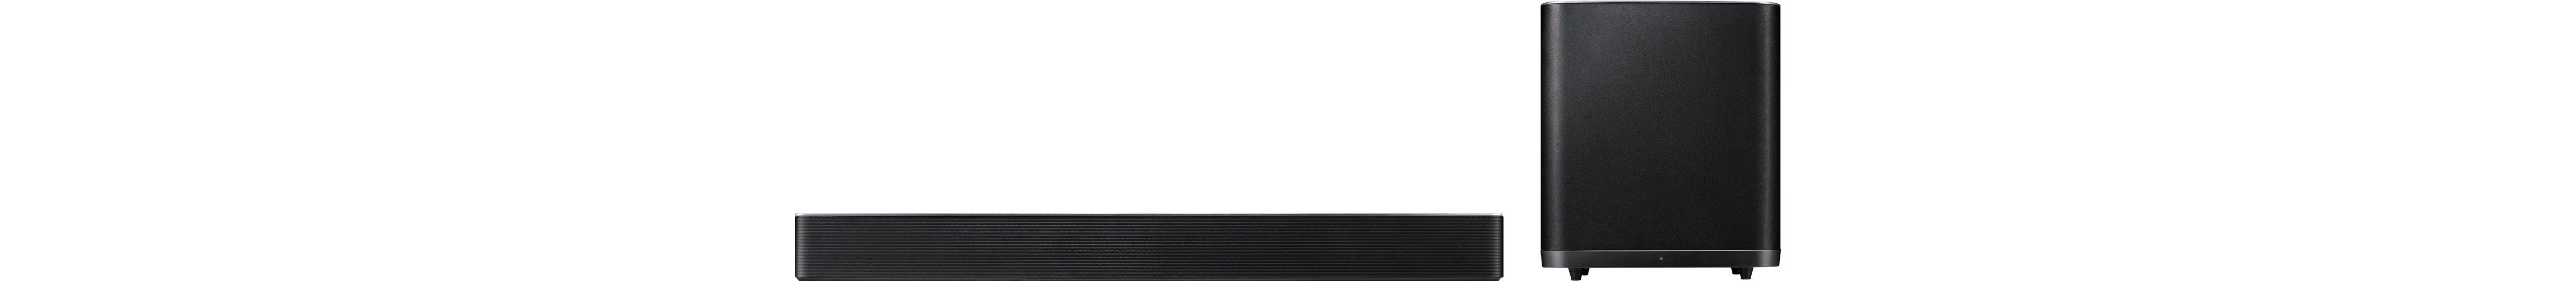 LG Music Flow LAC955M (HS9) Soundbar, Bluetooth, Multiroom, USB